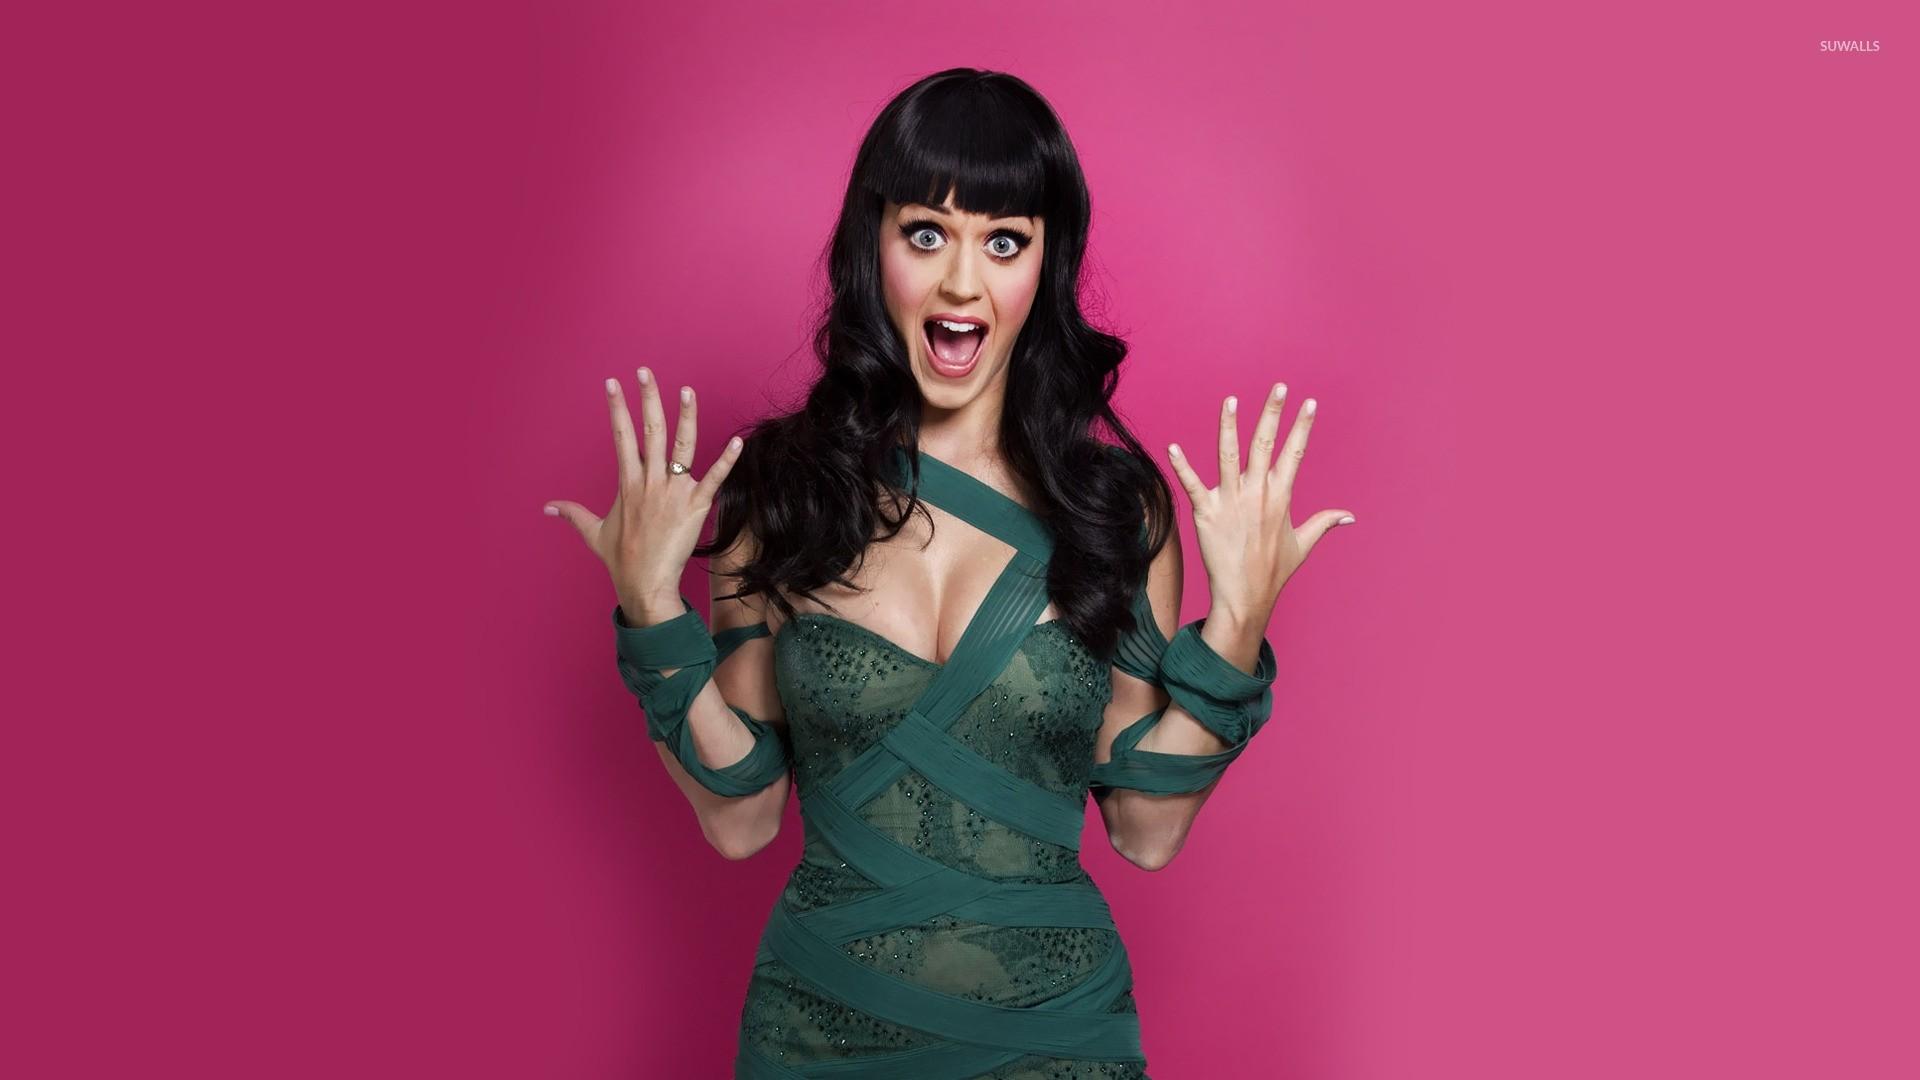 Katy Perry PC Wallpaper